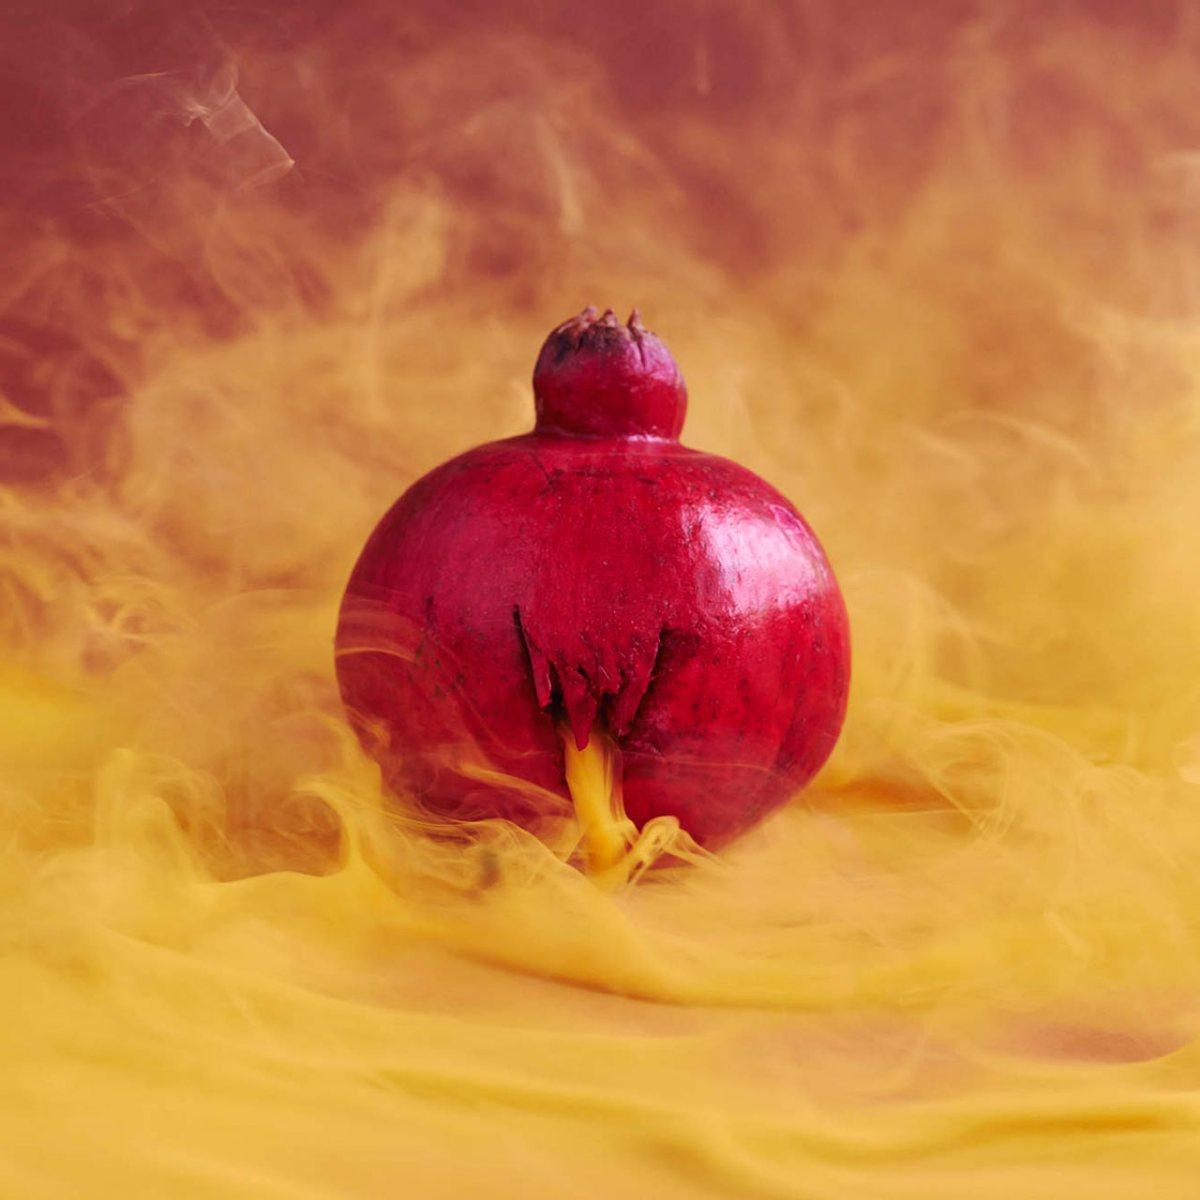 Maciek-Jasik-food-photos-moss-and-fog-9